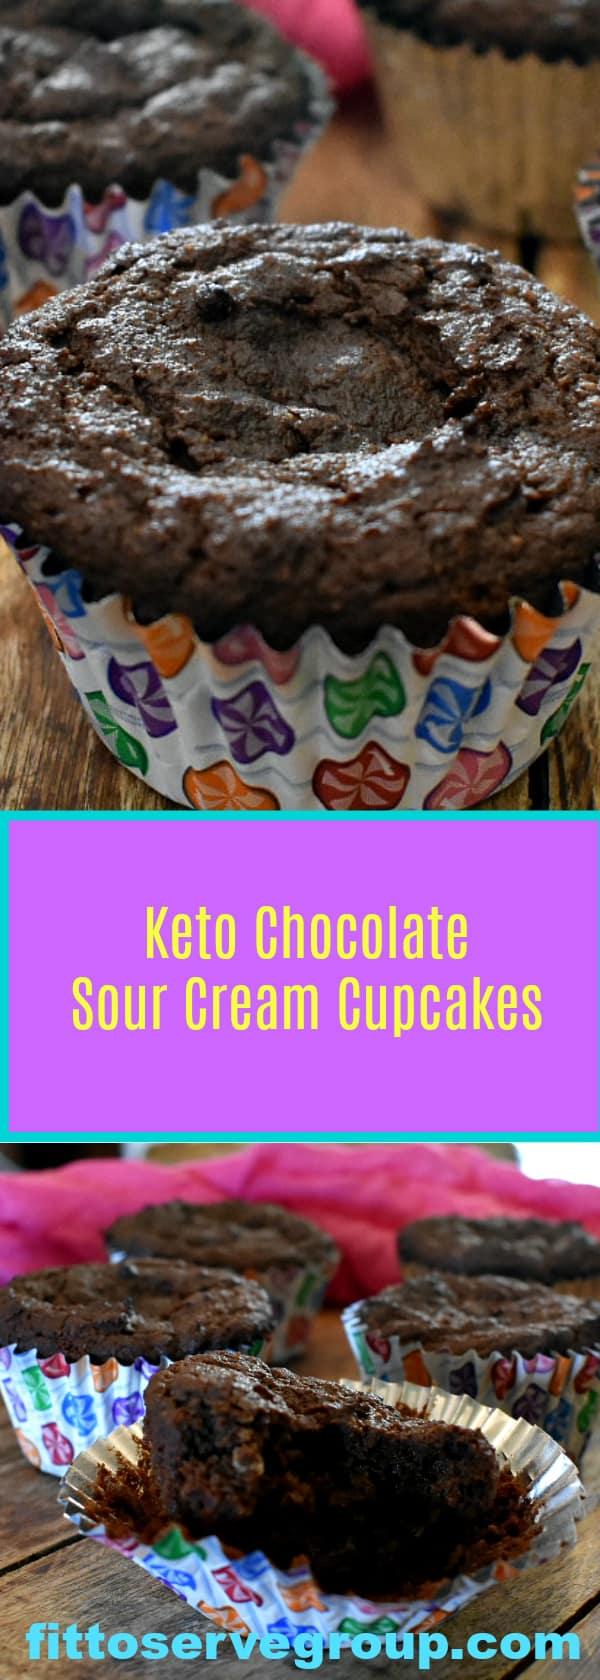 Keto Chocolate Sour Cream Cupcakes a rich low carb keto friendly chocolate cupcake recipe.